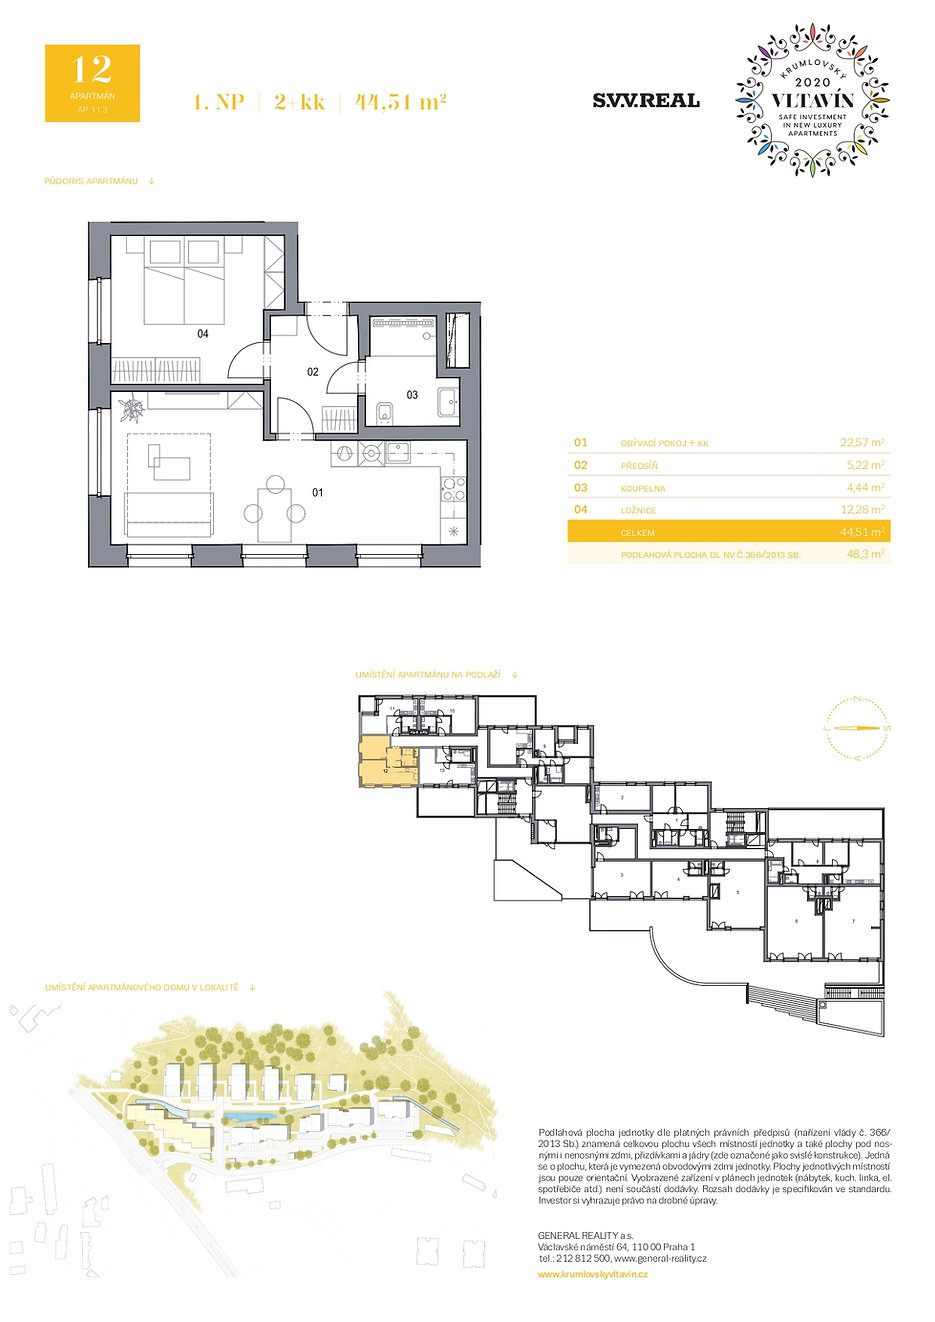 GR_krumlovsky-vltavin_bytove-karty-apartmany_1NP_A12_page-0001.jpg